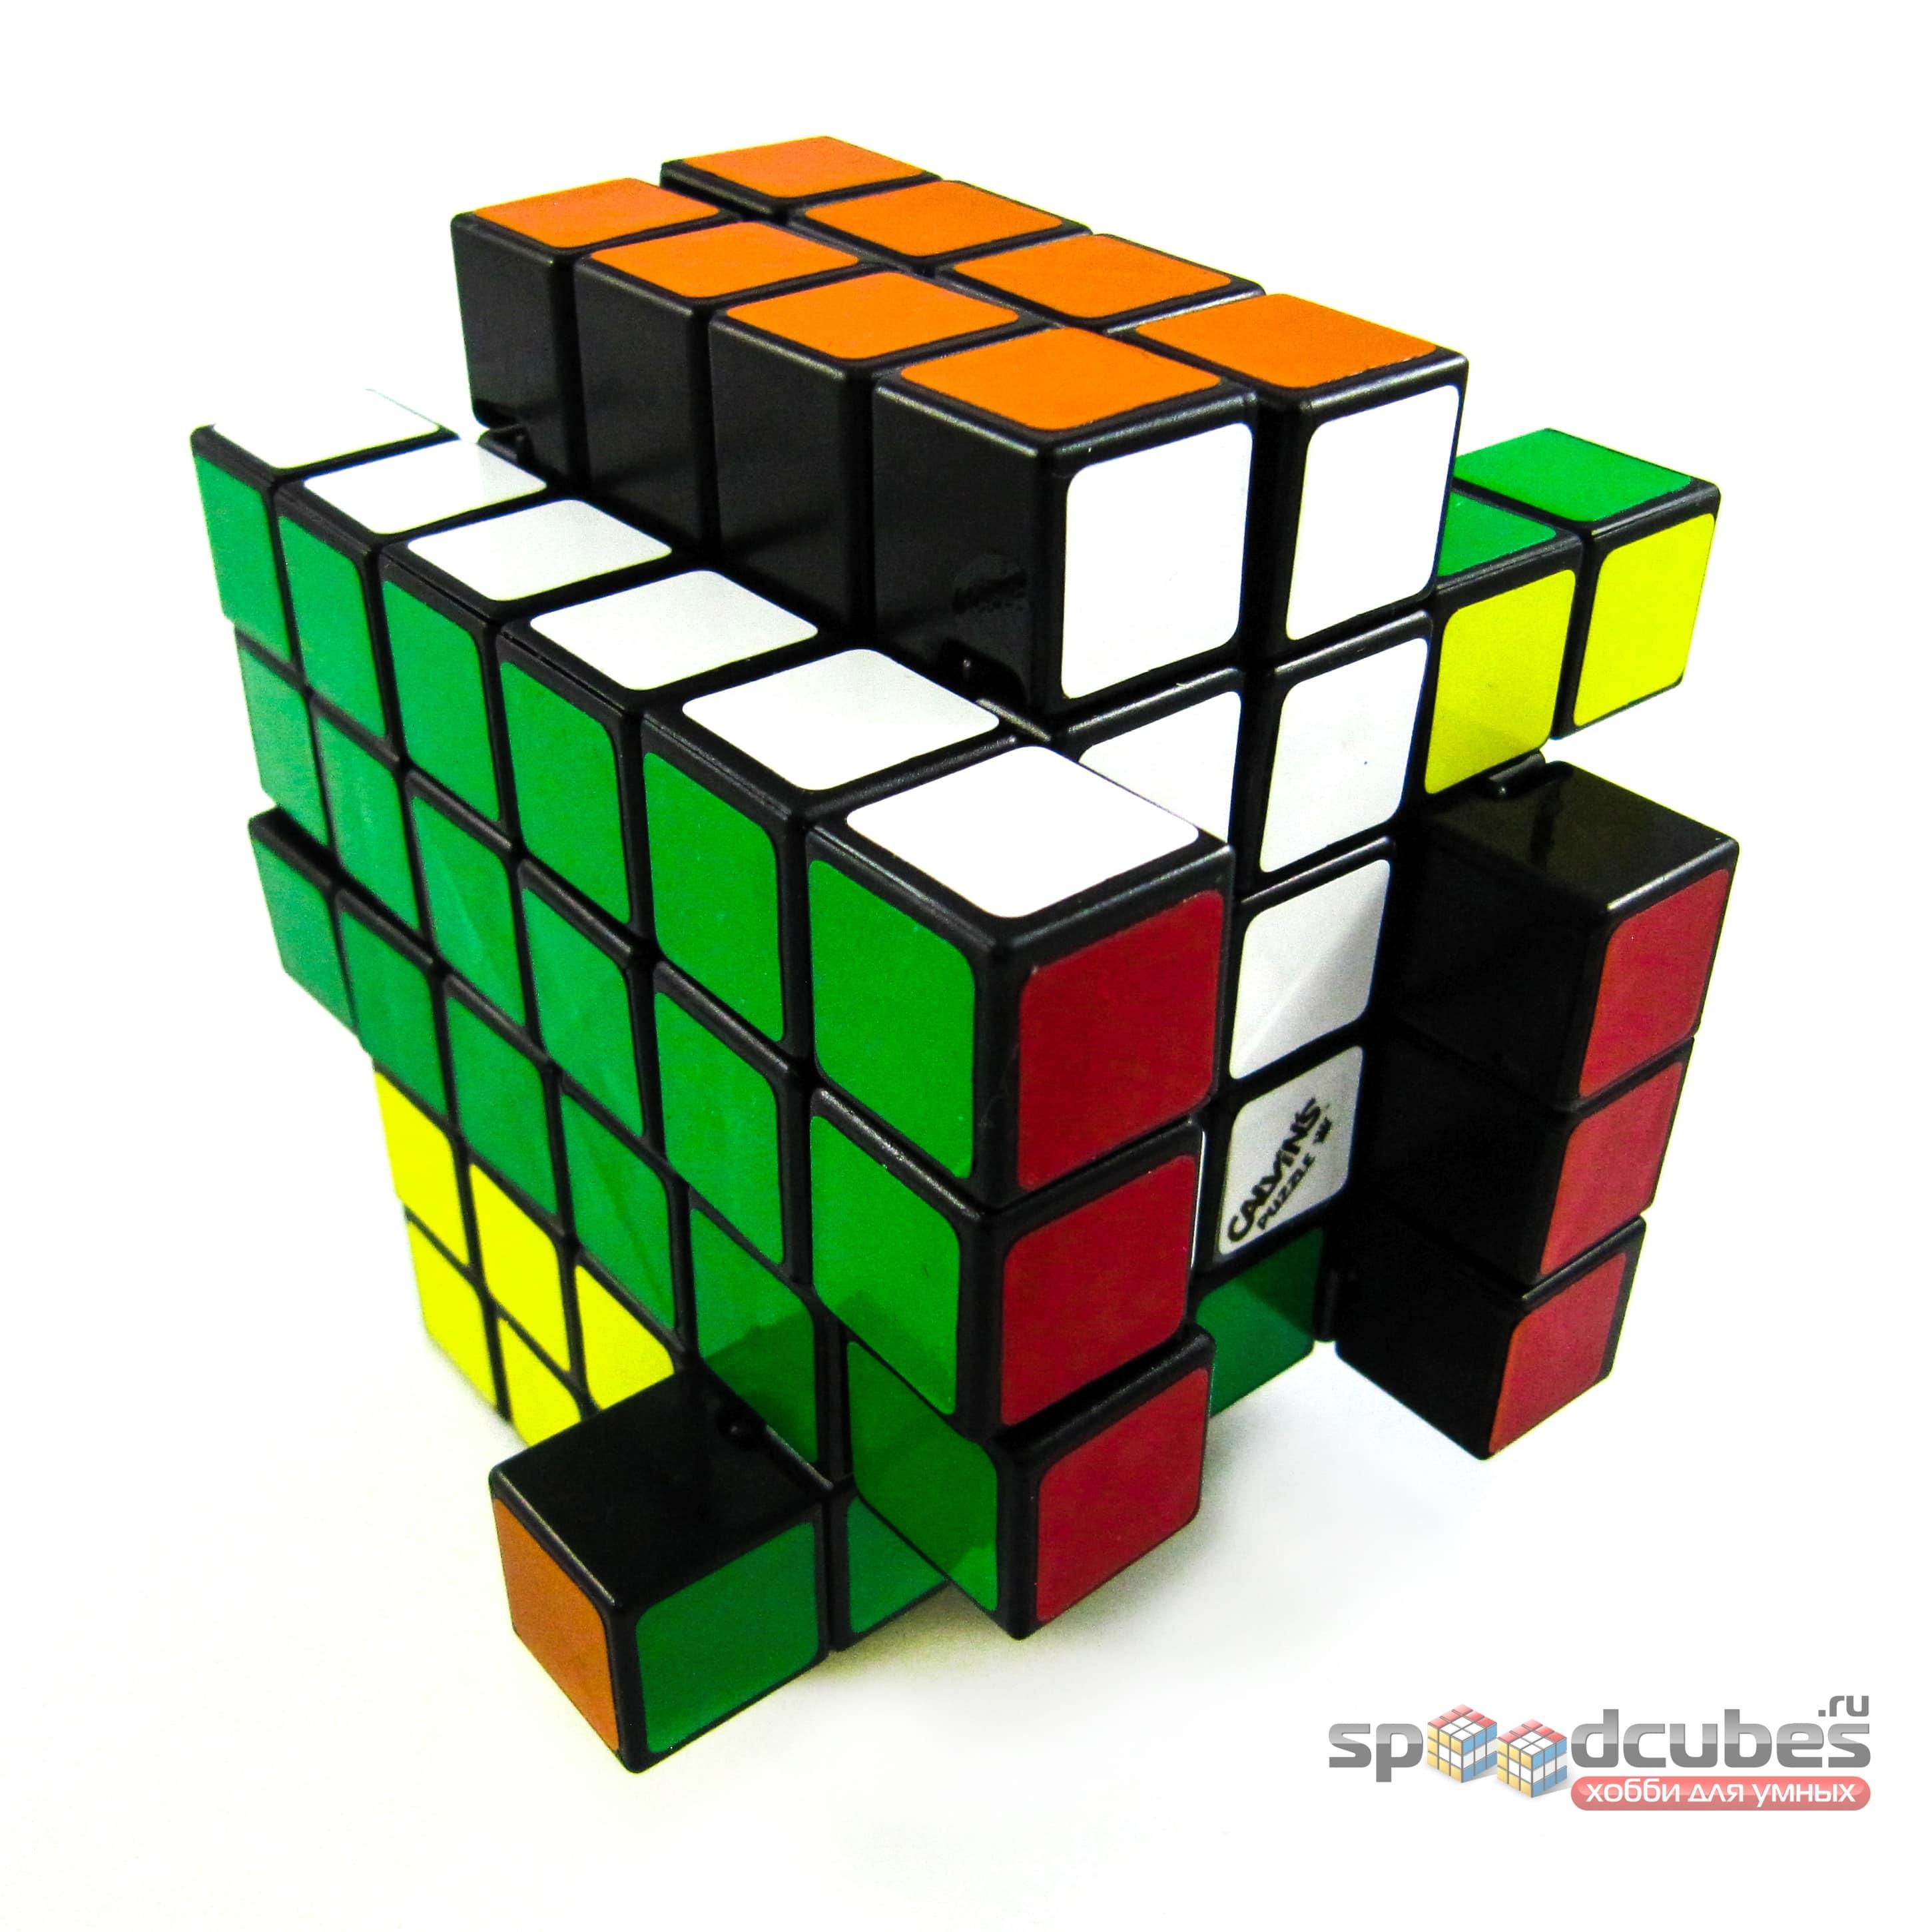 Calvin's 4x4x6 3